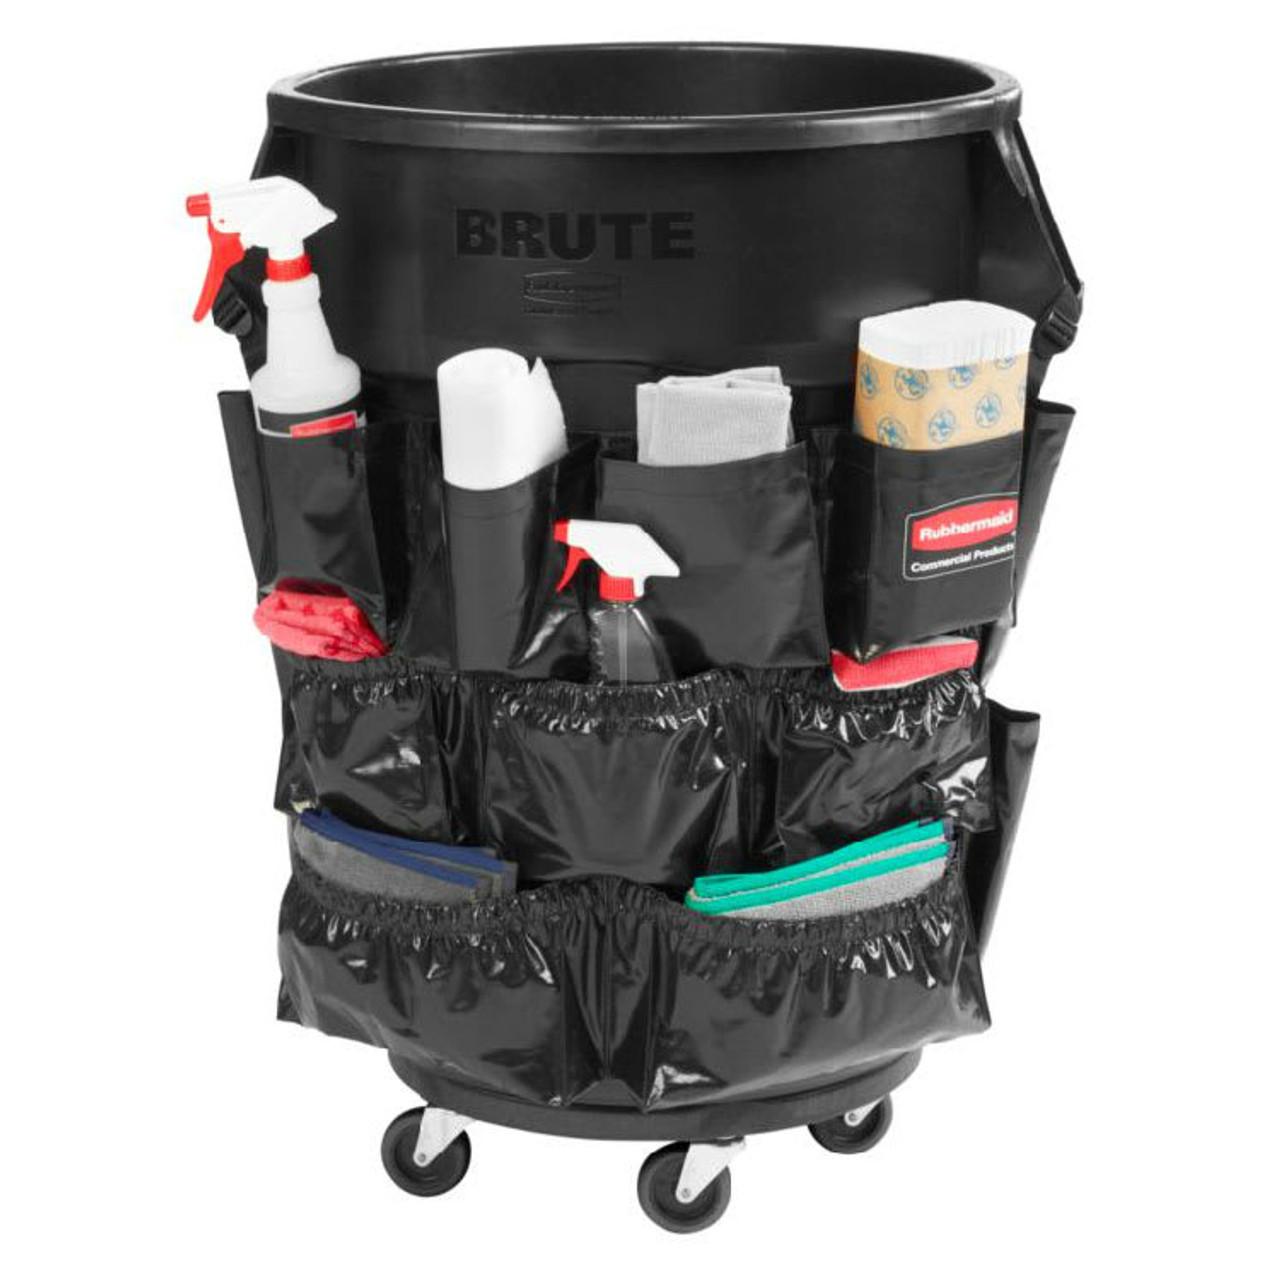 Rubbermaid Executive Brute Caddy Bag Black - 1867533